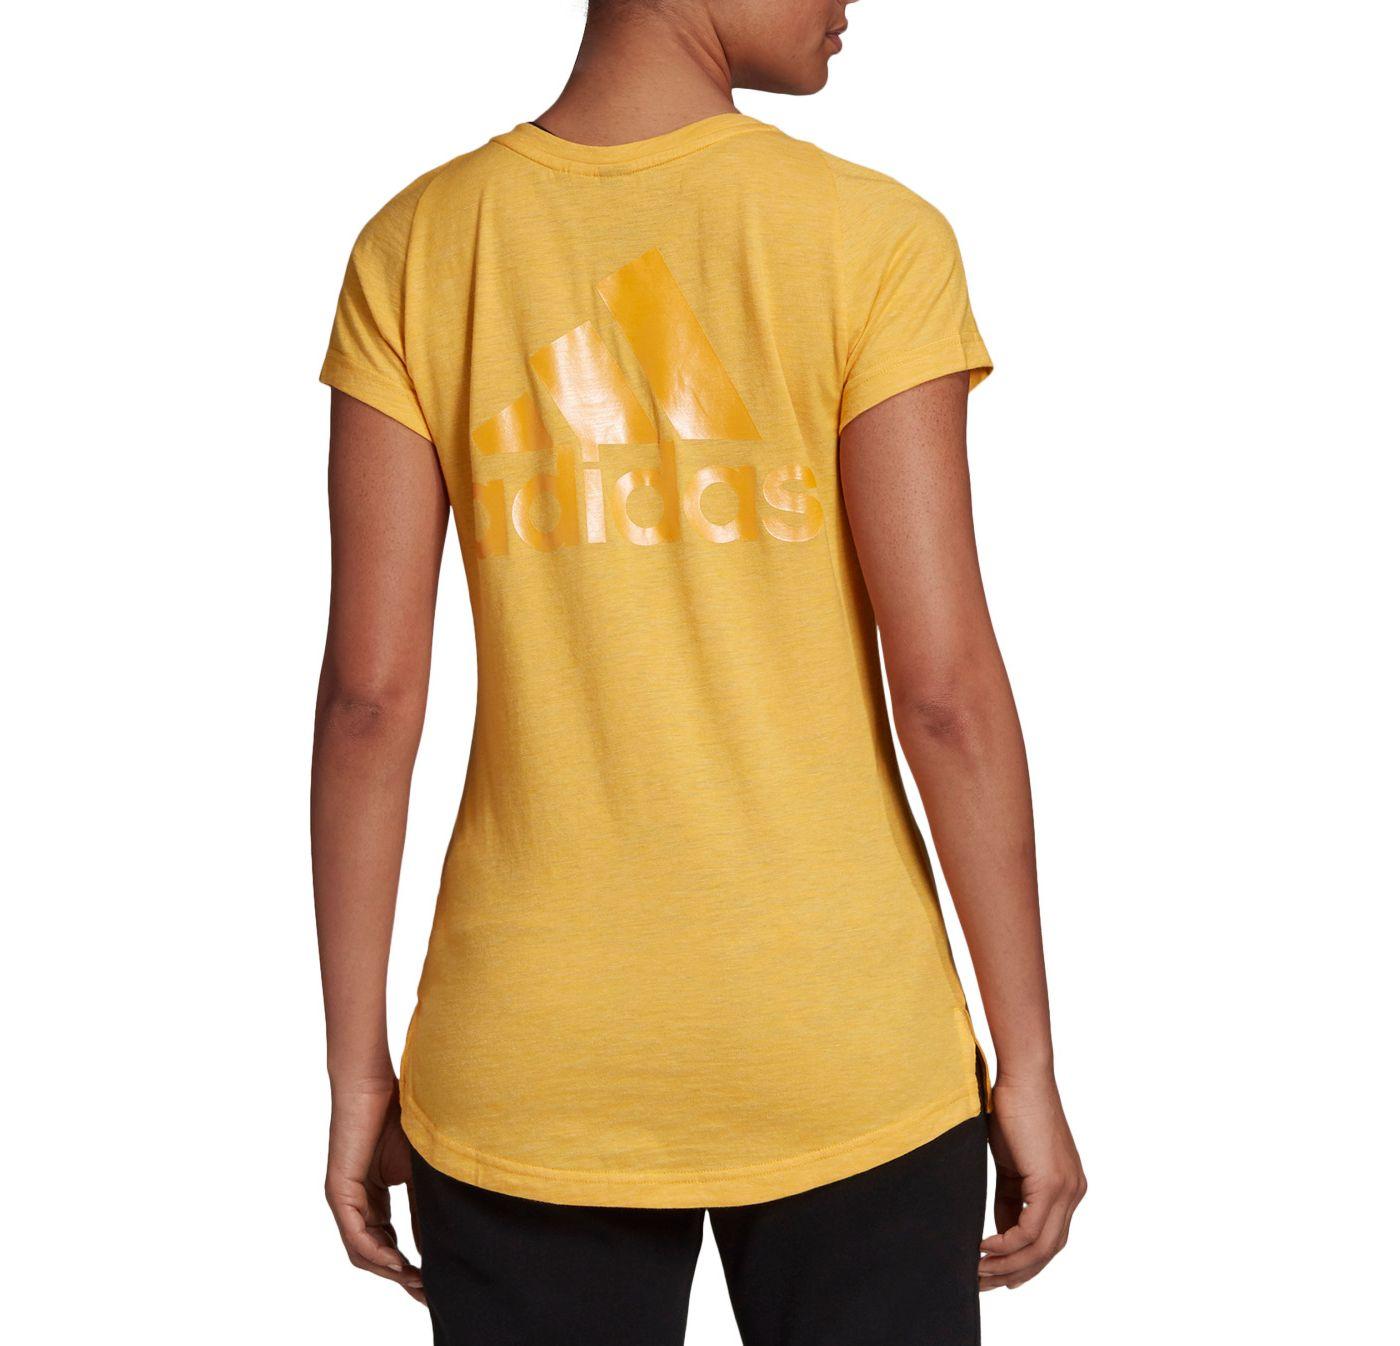 adidas Women's ID Winner's V-Neck Shirt